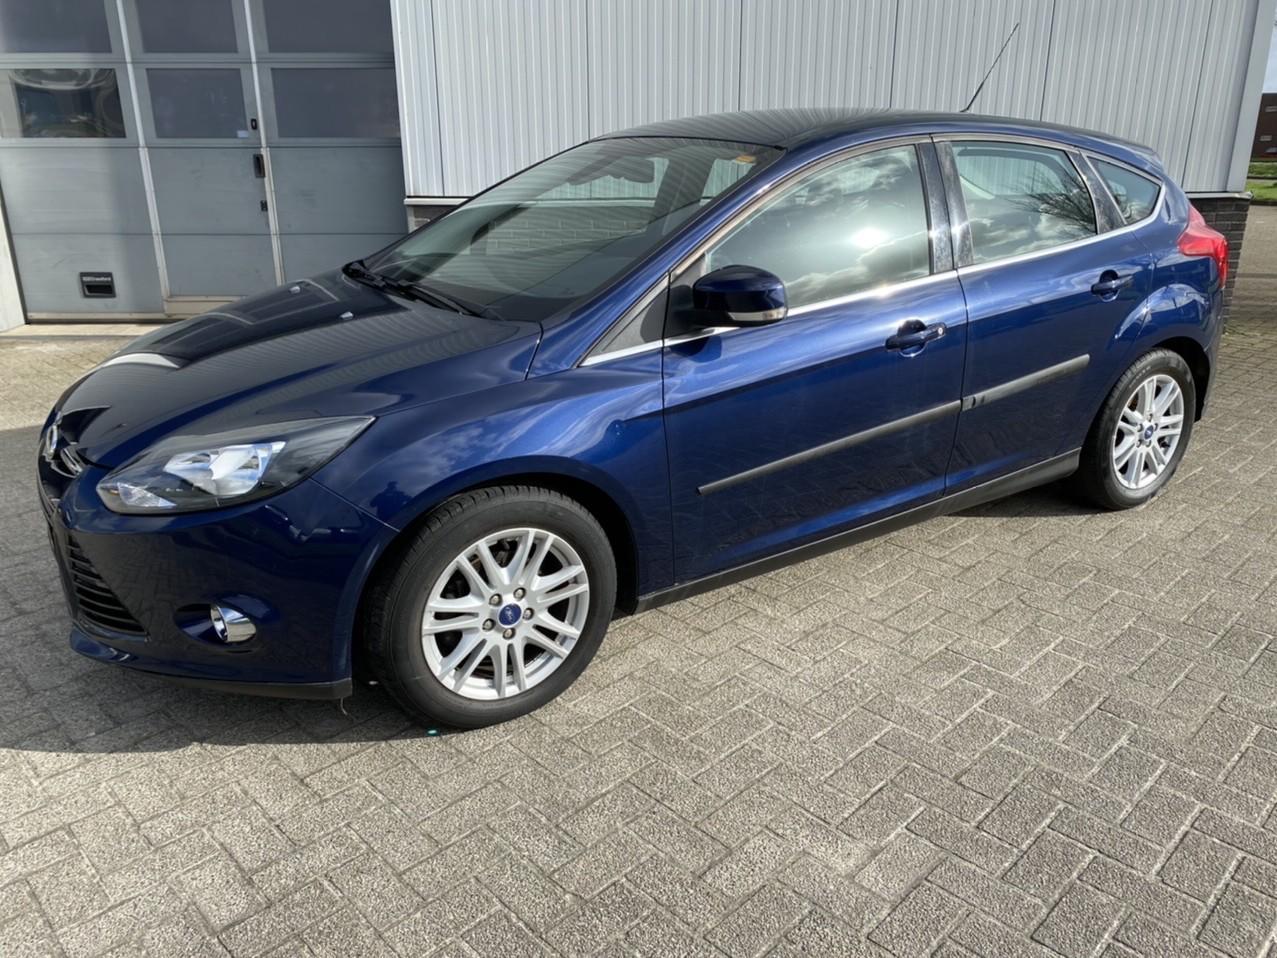 Ford Focus 1.0 ecoboost 125pk 5-deurs titanium rijklaar prijs